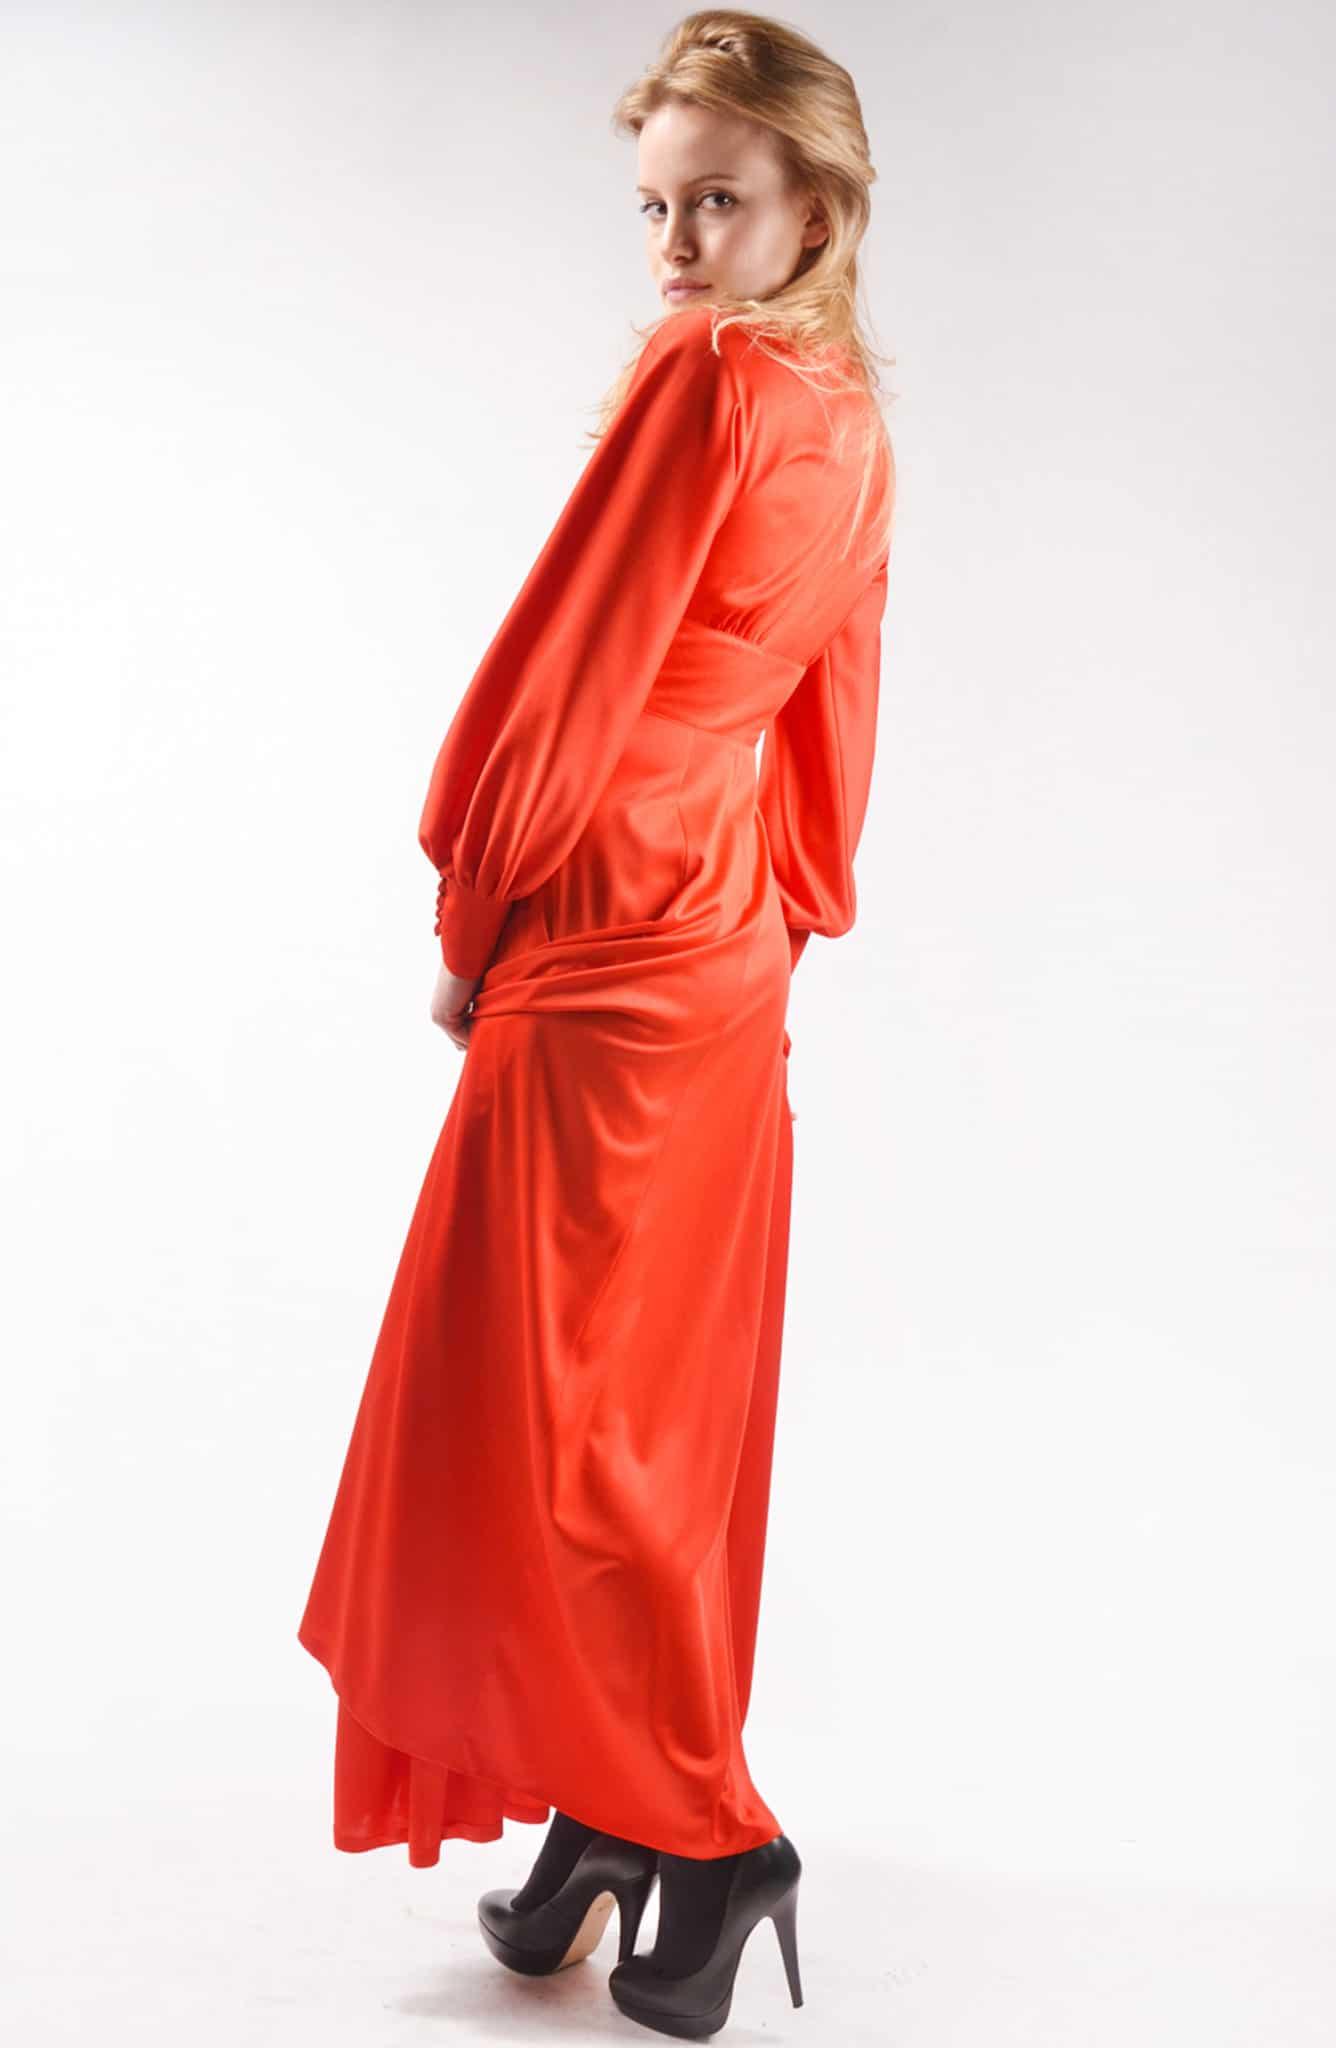 Doortje model Dephine Duister